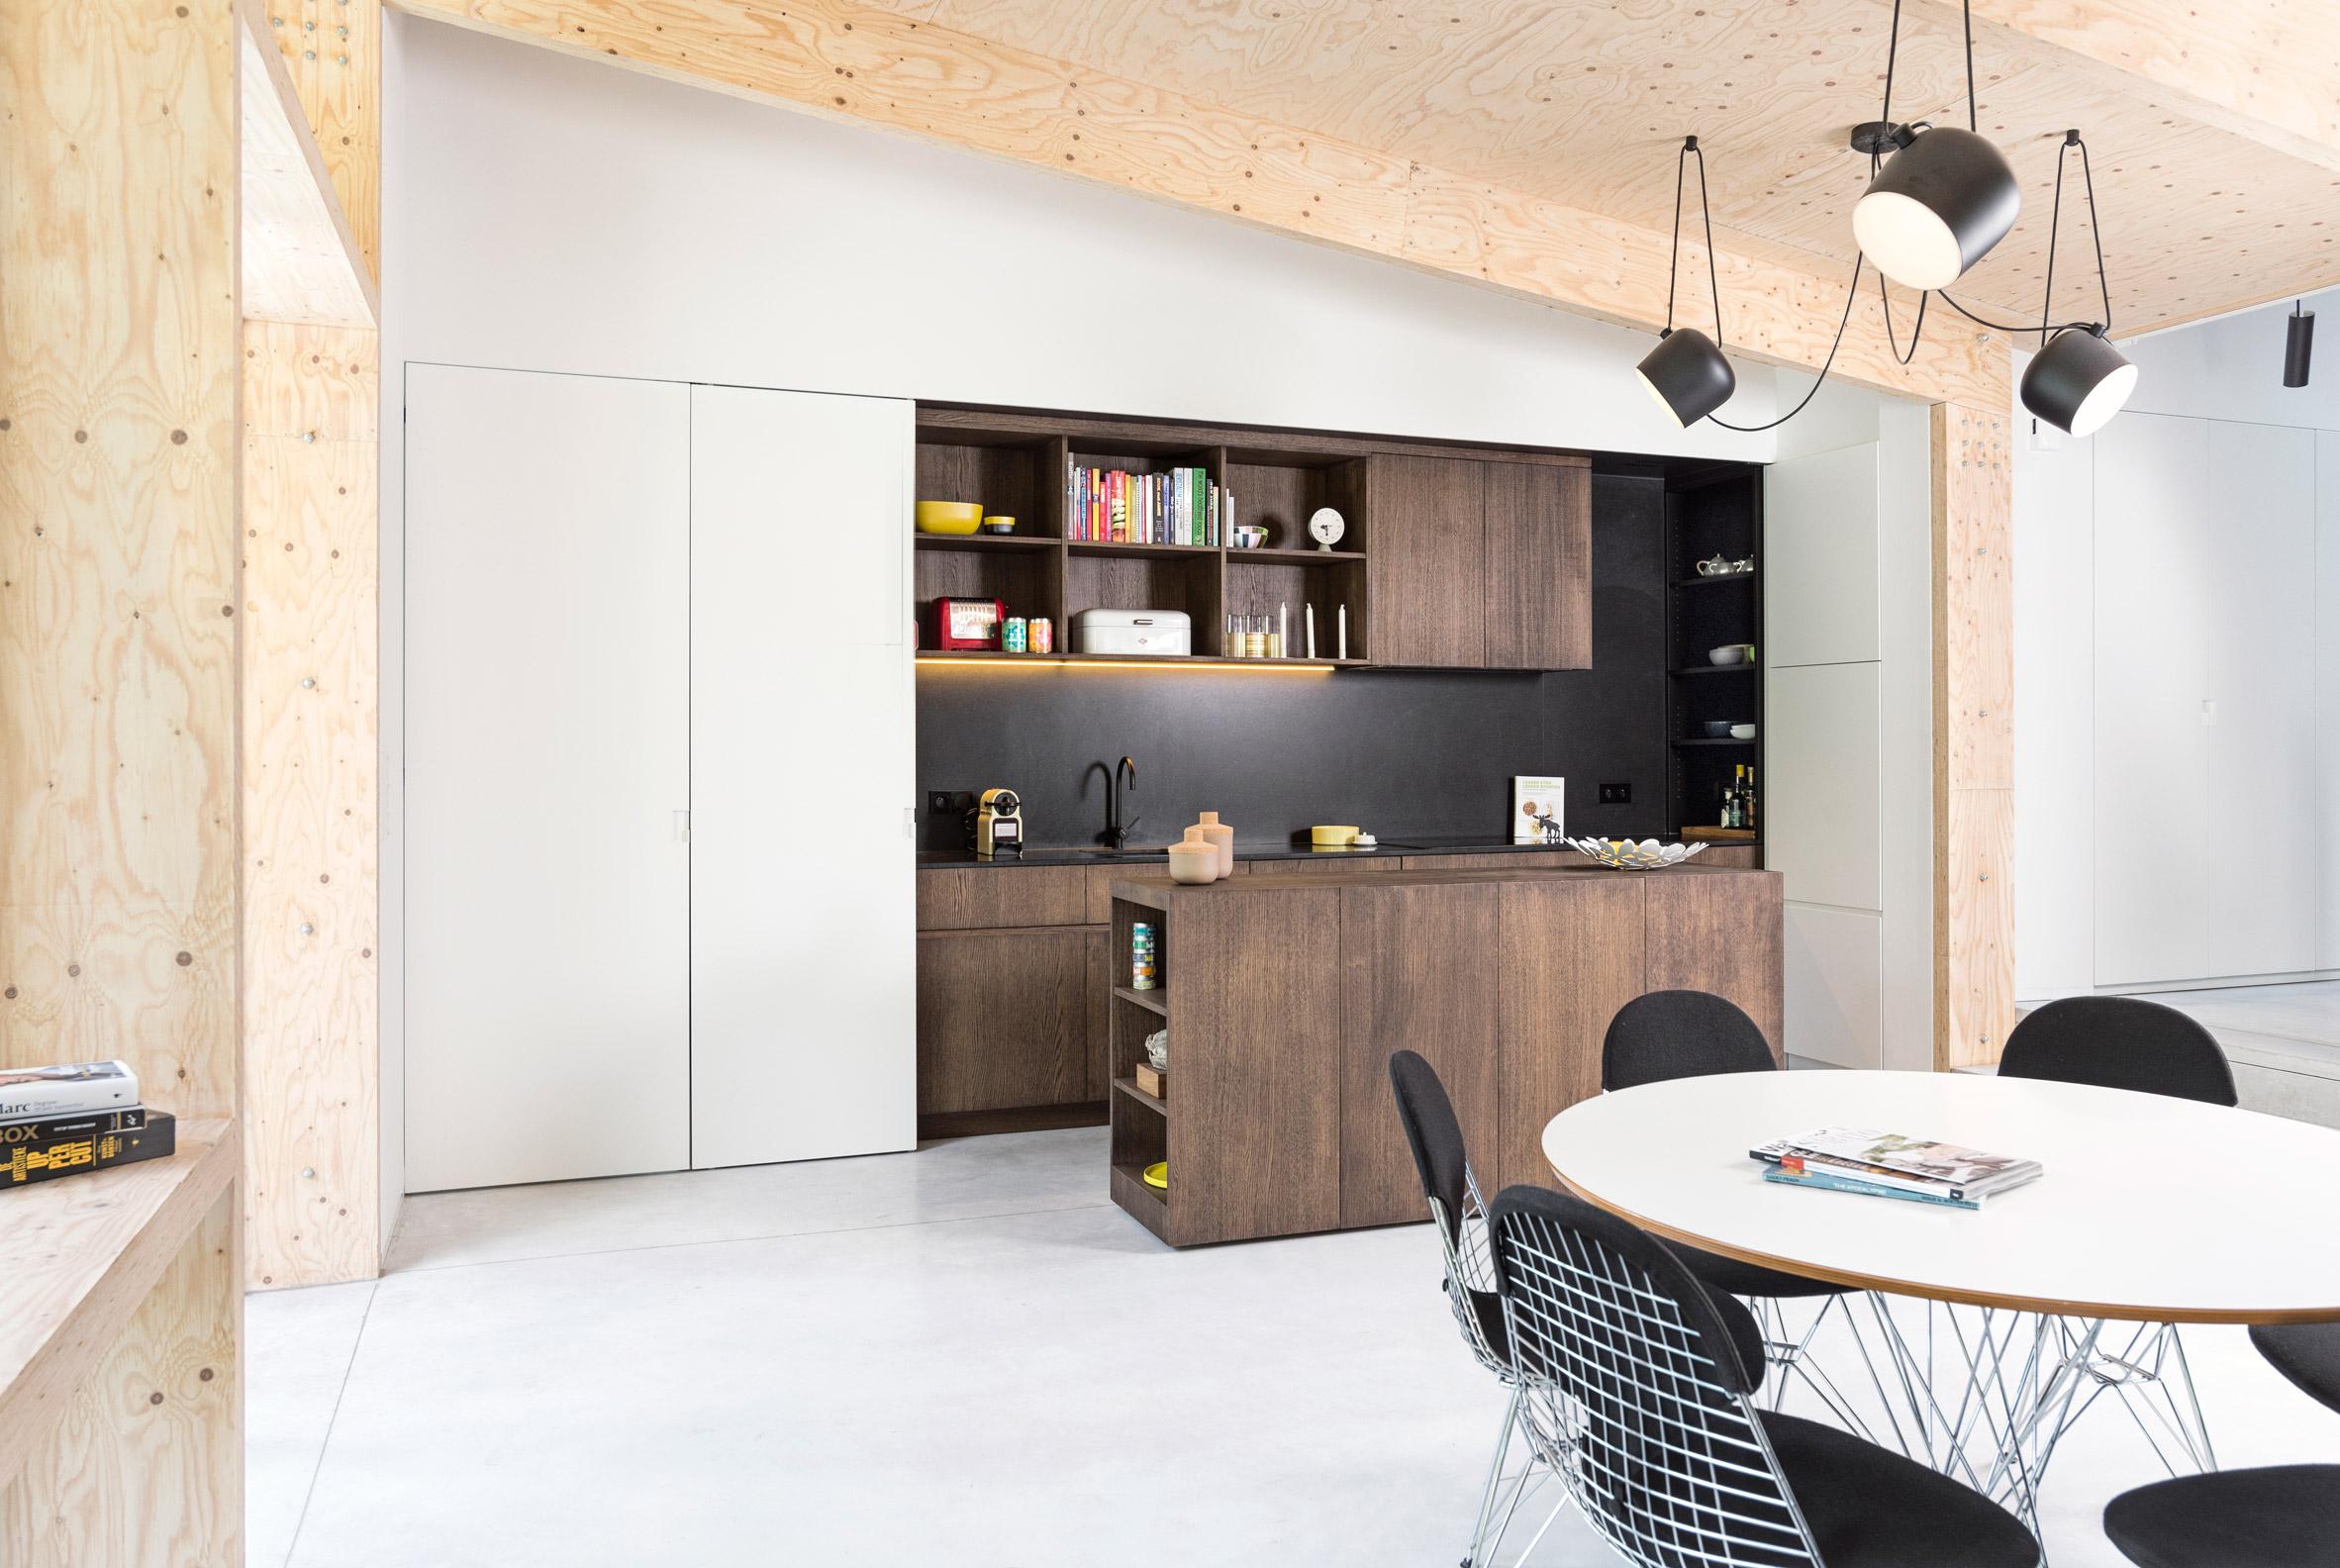 semi-detached-house-with-an-outdoor-area-studio-k-rob-mols-belgium_dezeen_2364_col_0